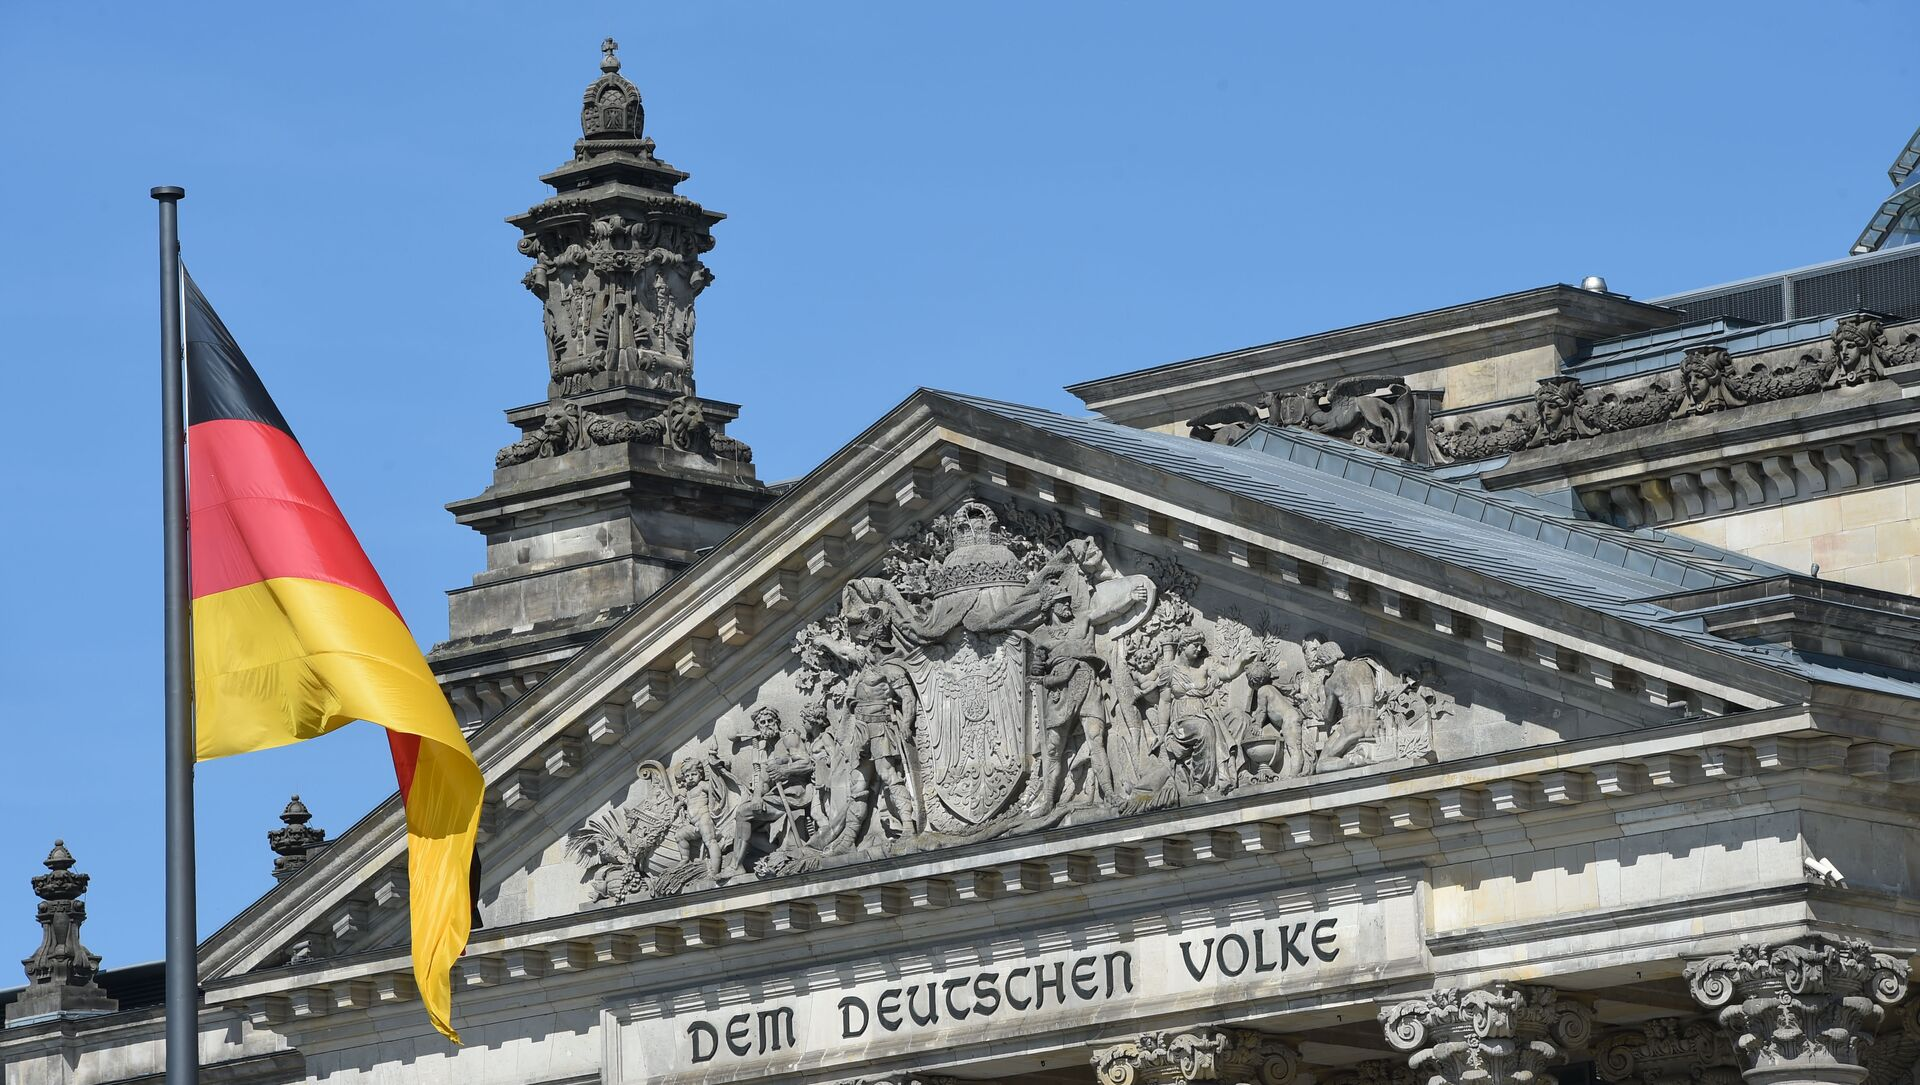 Флаг Германии перед зданием Бундестага в Берлине, фото из архива - Sputnik Azərbaycan, 1920, 26.09.2021